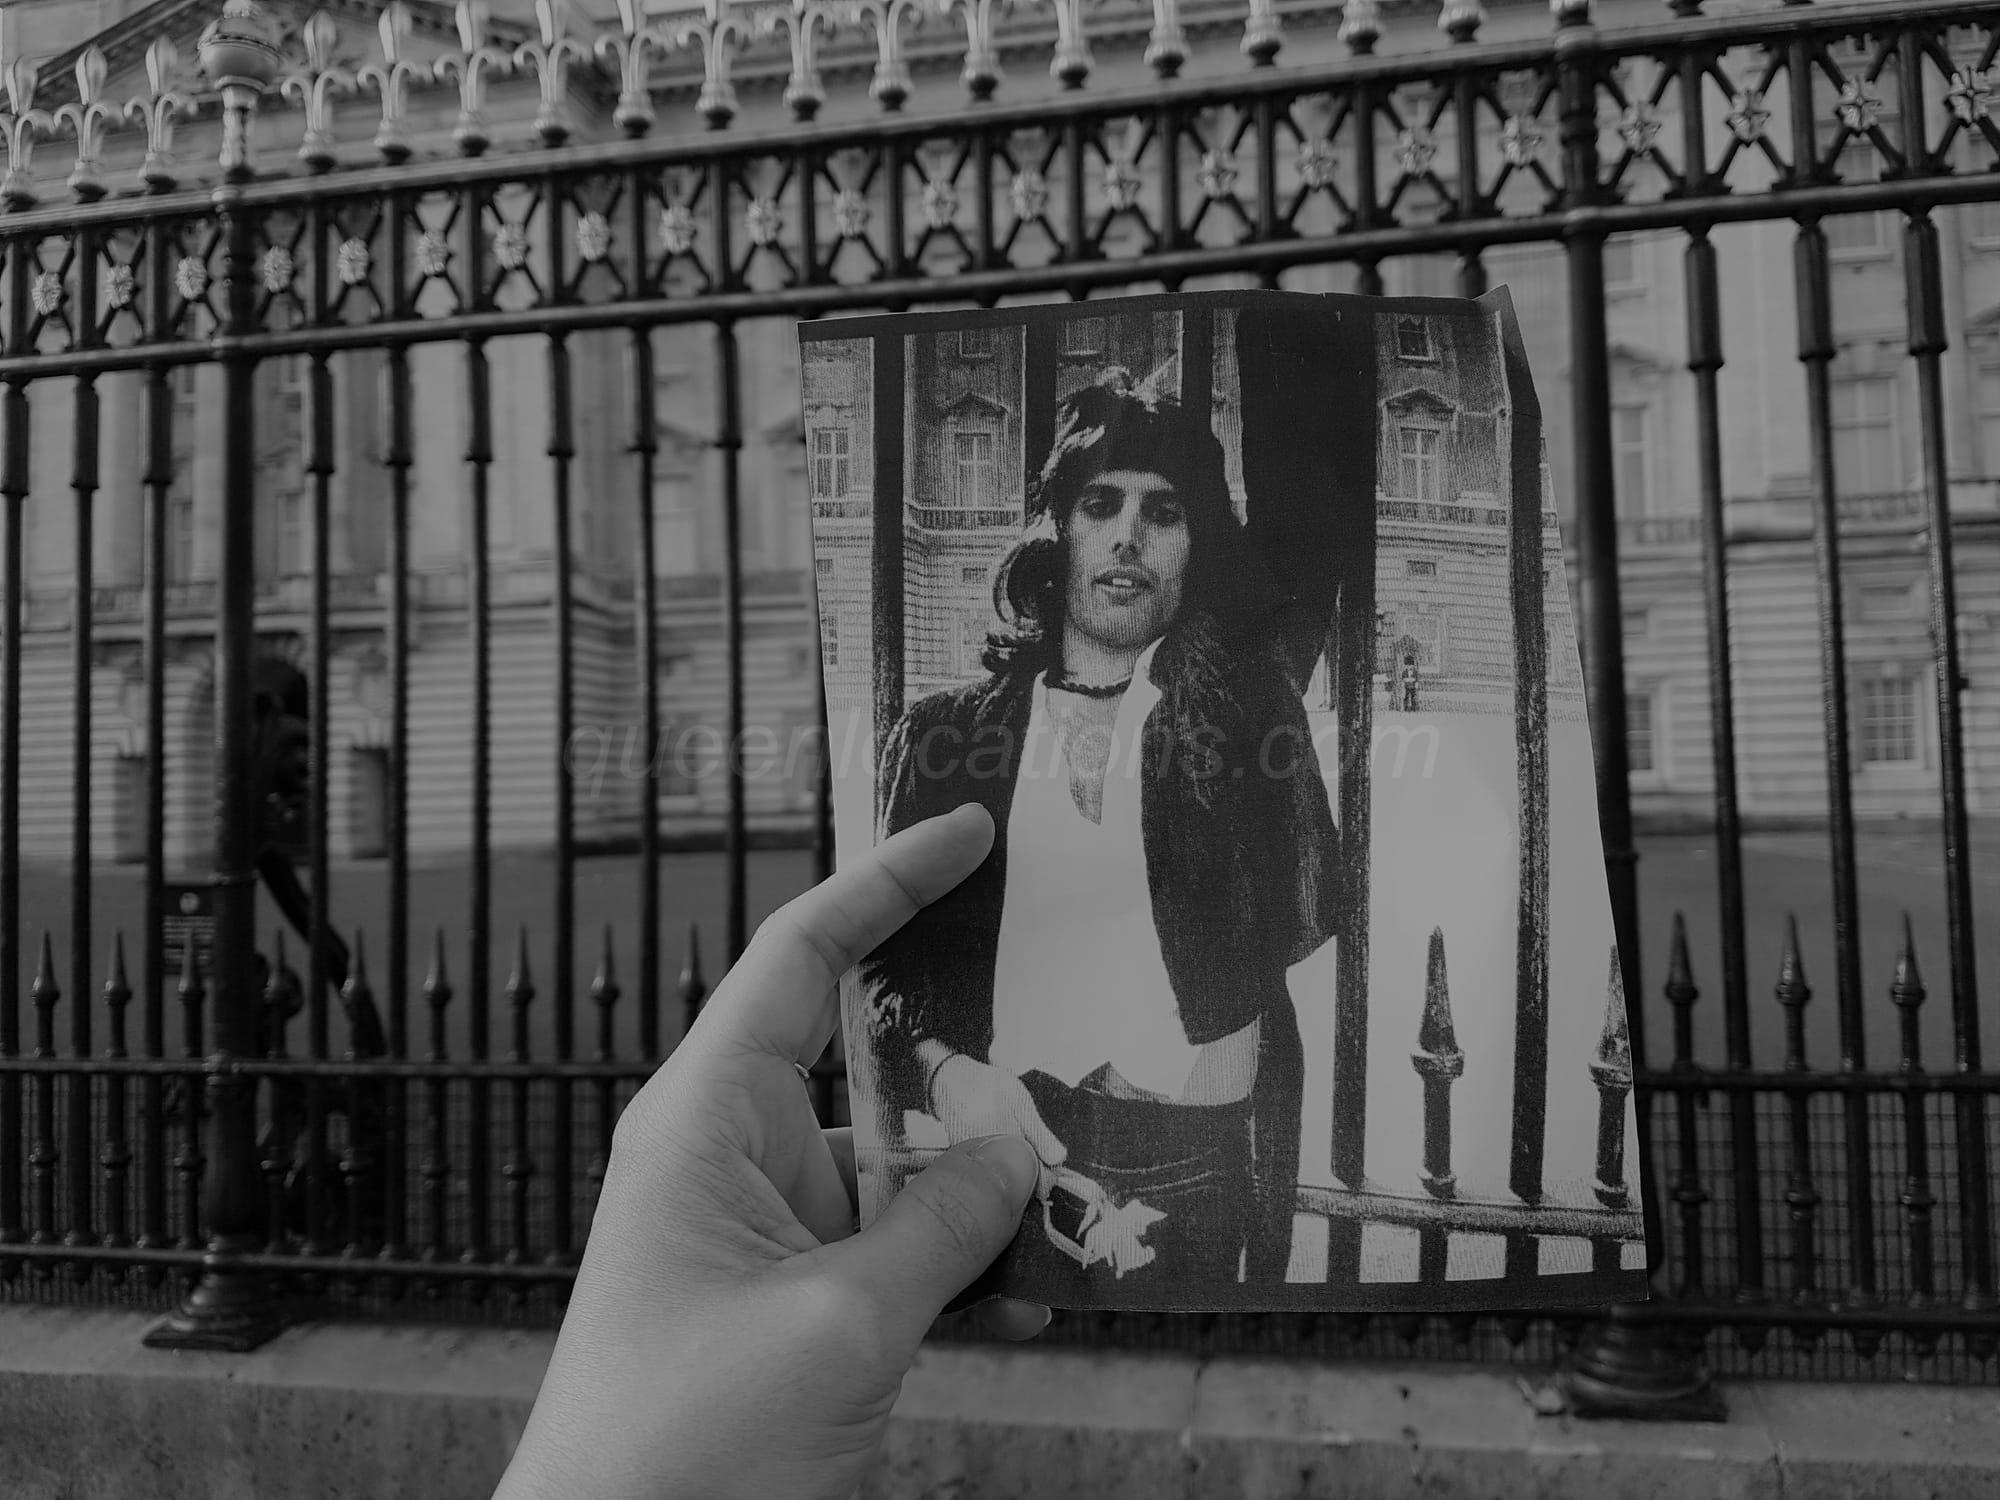 Buckingham Palace Freddie Mercury